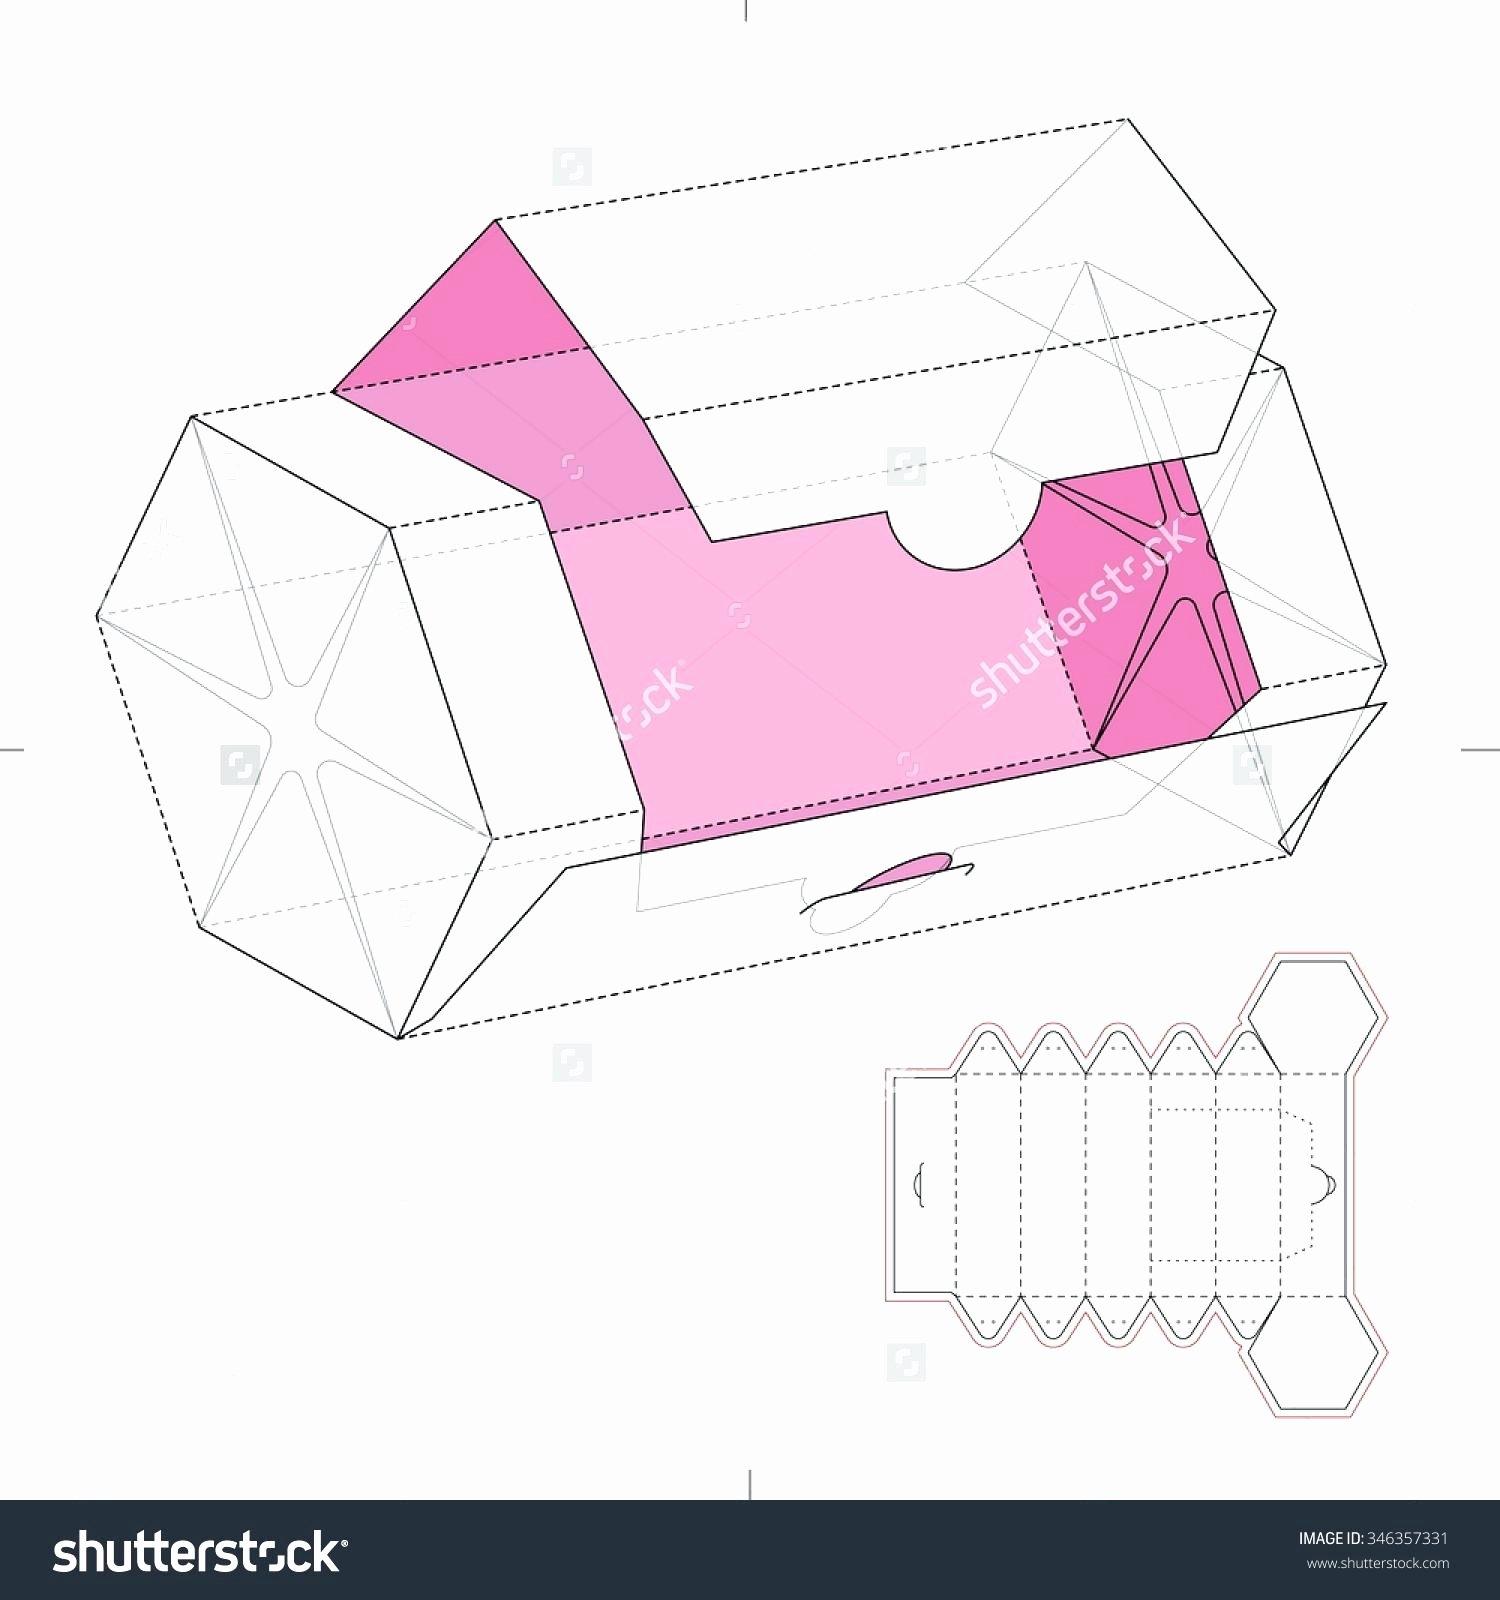 Die Cut Box Template Inspirational Printable Diamond Shape Gift Box Template Printable